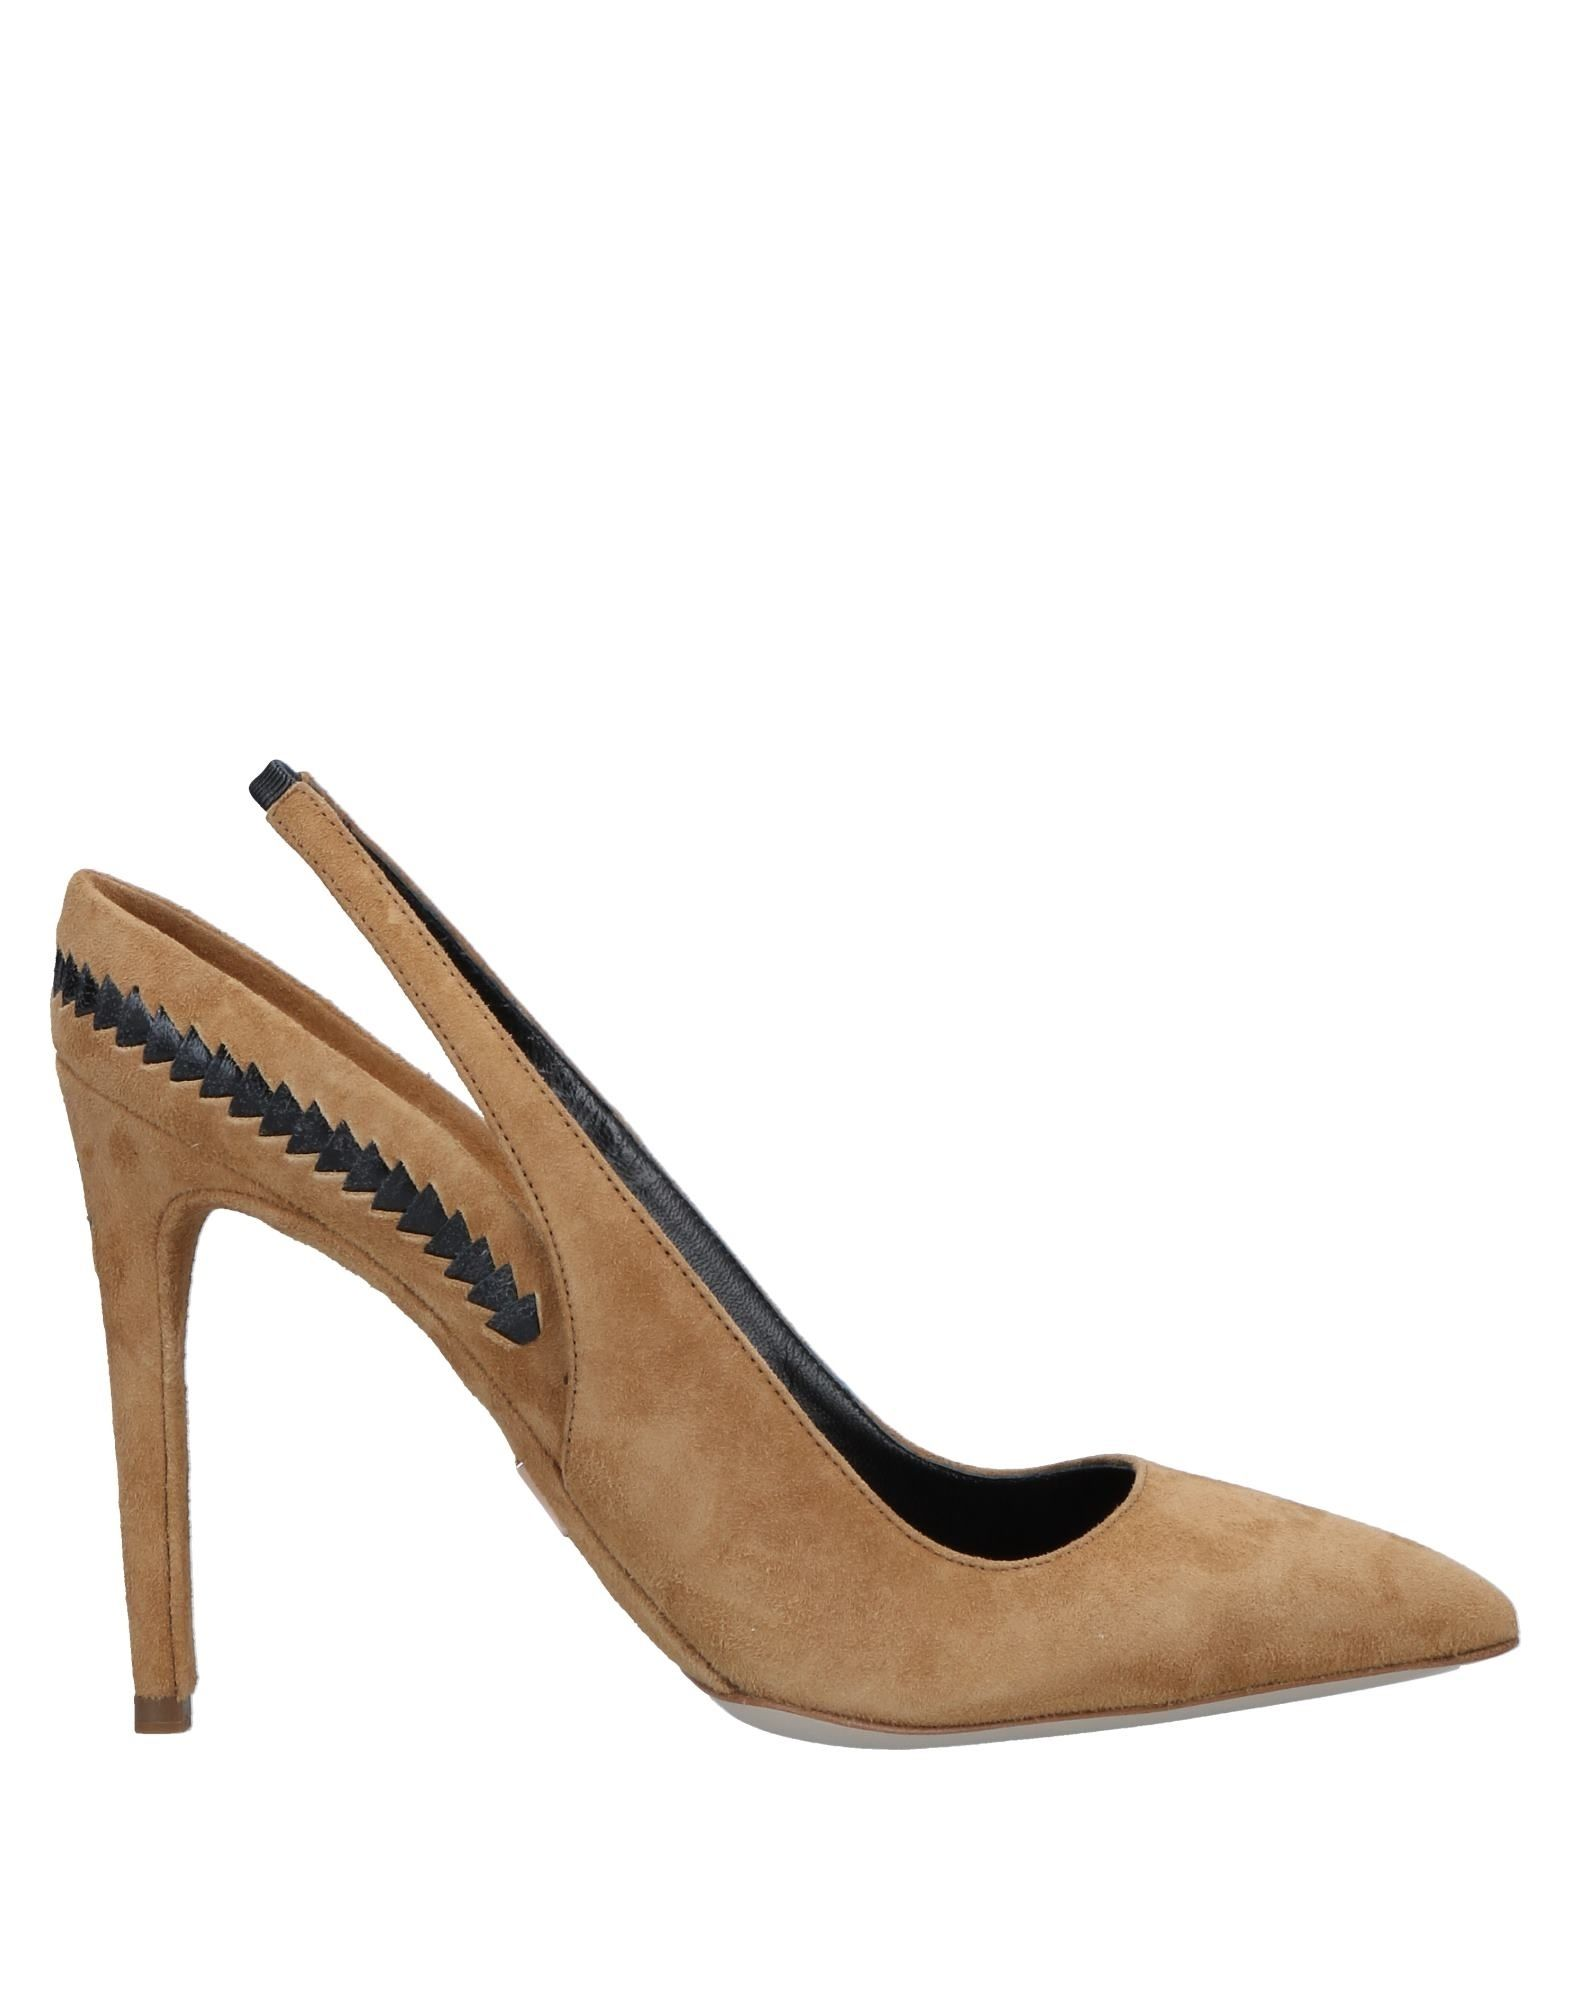 Rabatt Schuhe Daniele Michetti Pumps Damen  11560325PA